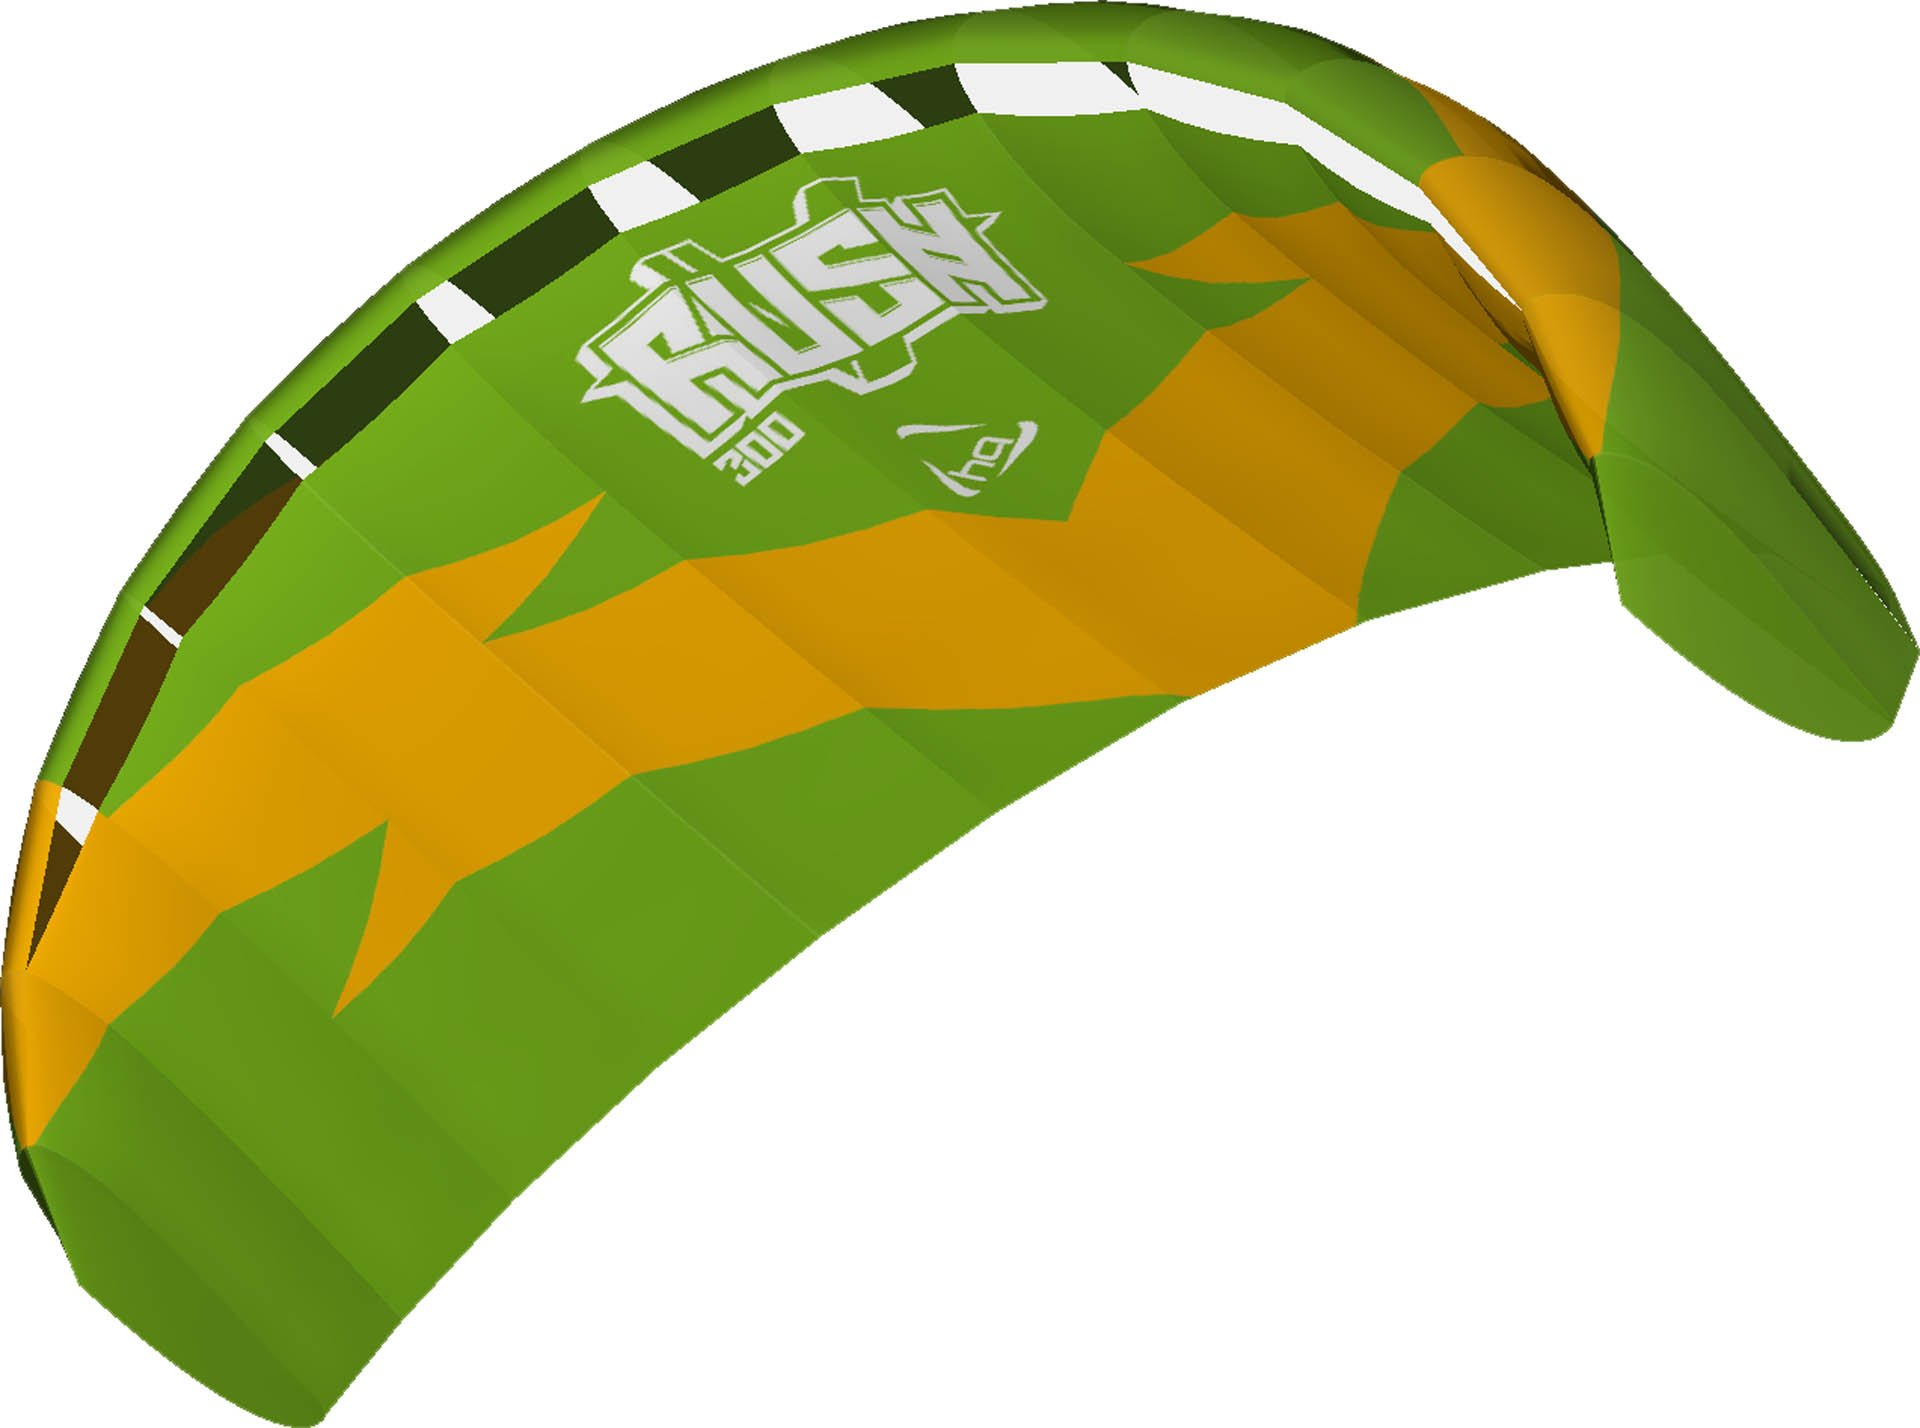 HQ Kites and Designs 118034 Rush V 300 R2F Kite by HQ Kites and Designs